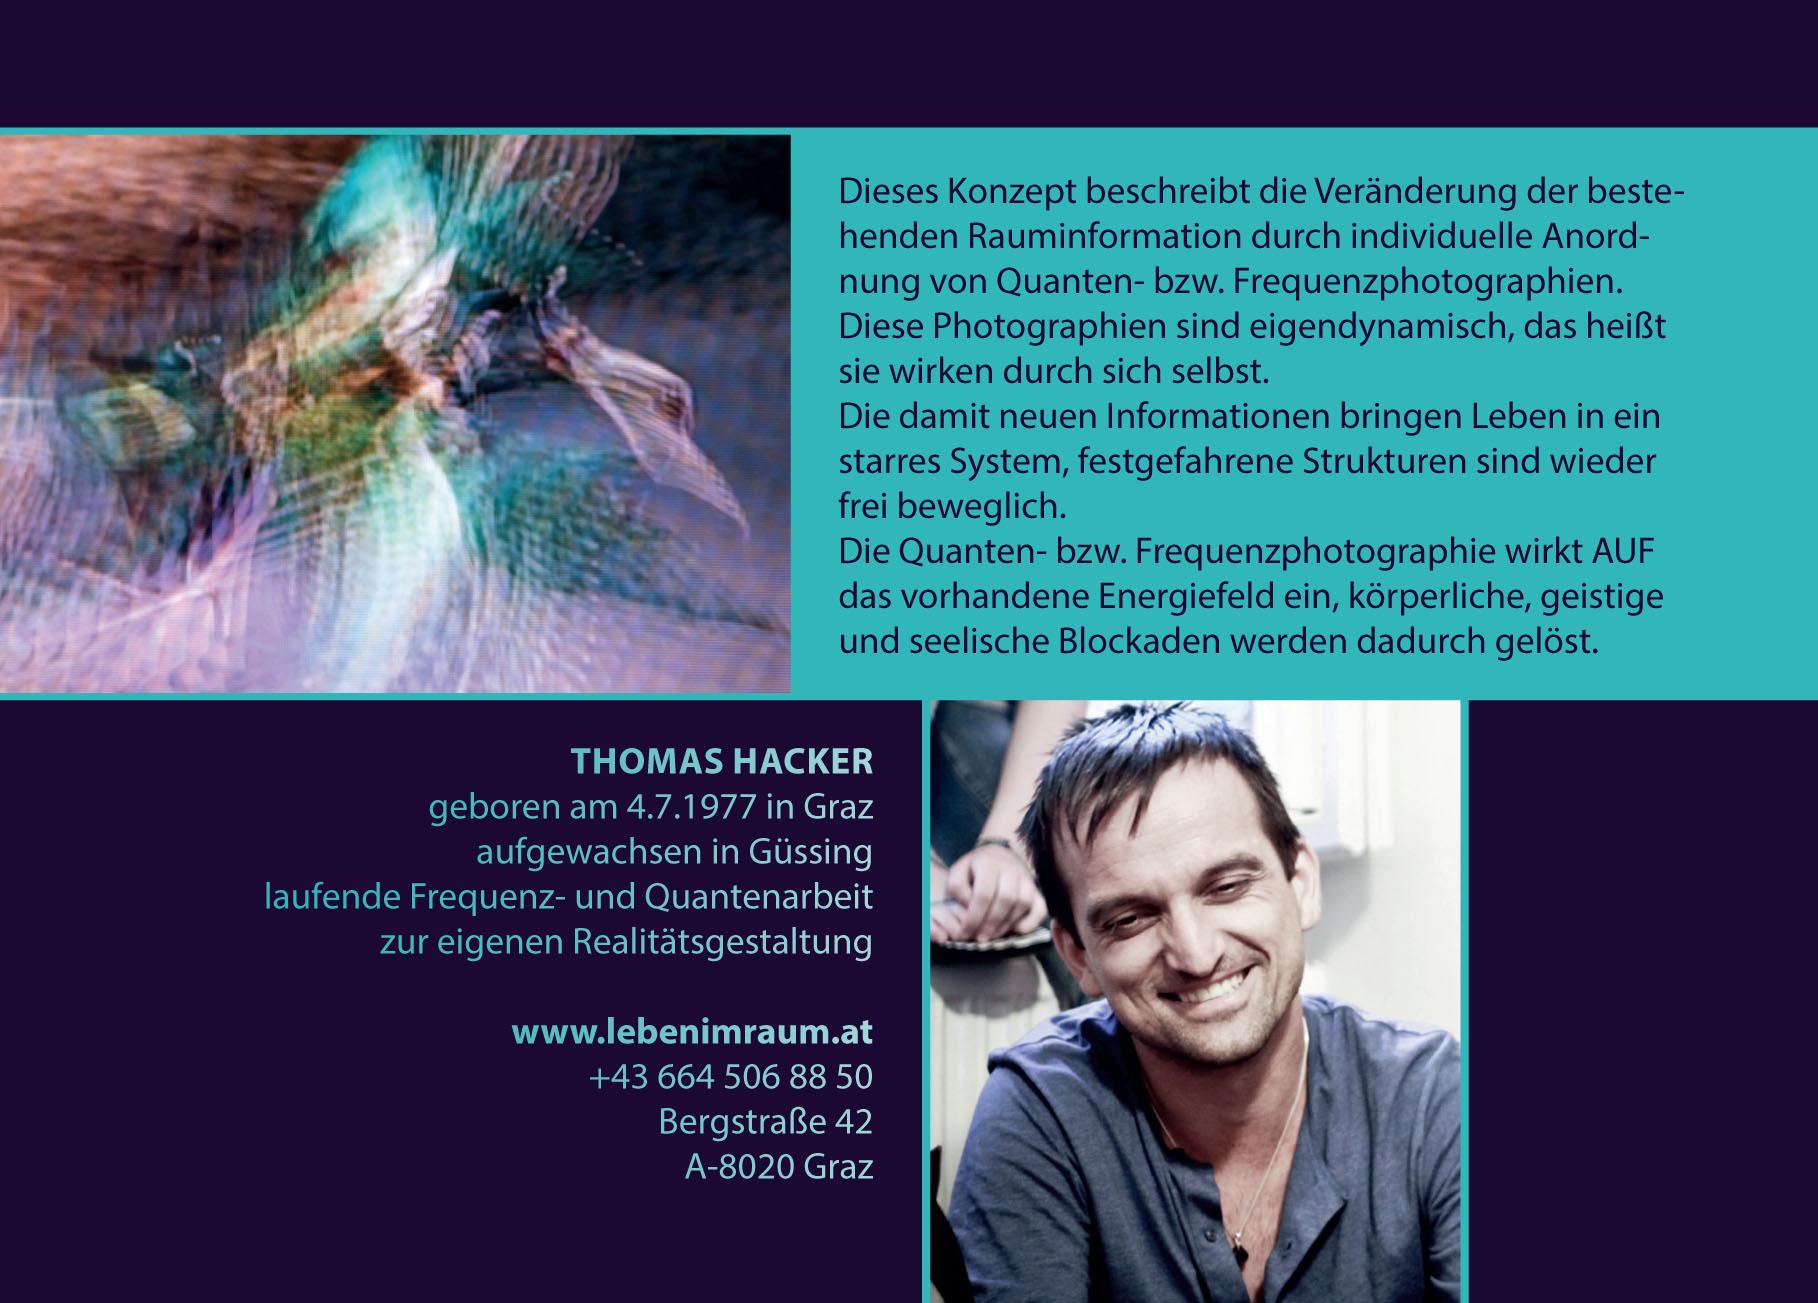 Flyer-Ausstellung-Hacker-14-02-2014-rz-2